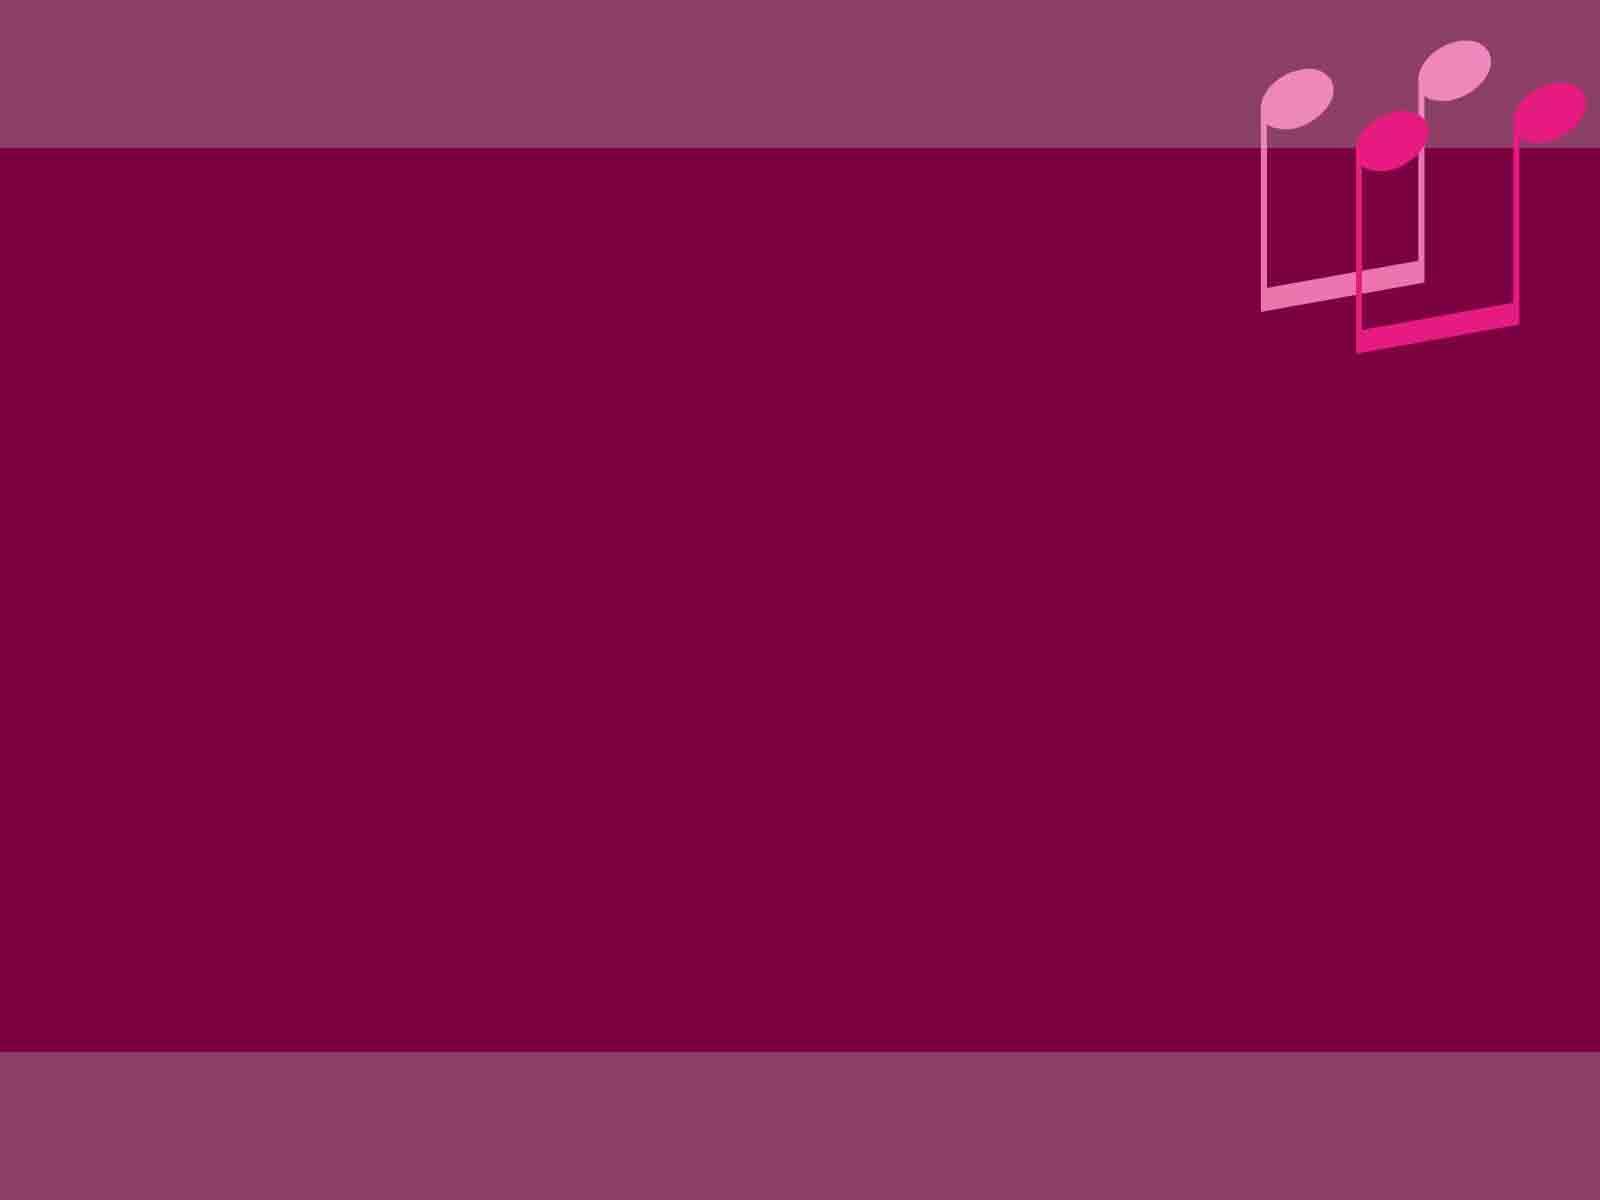 pink music ppt design